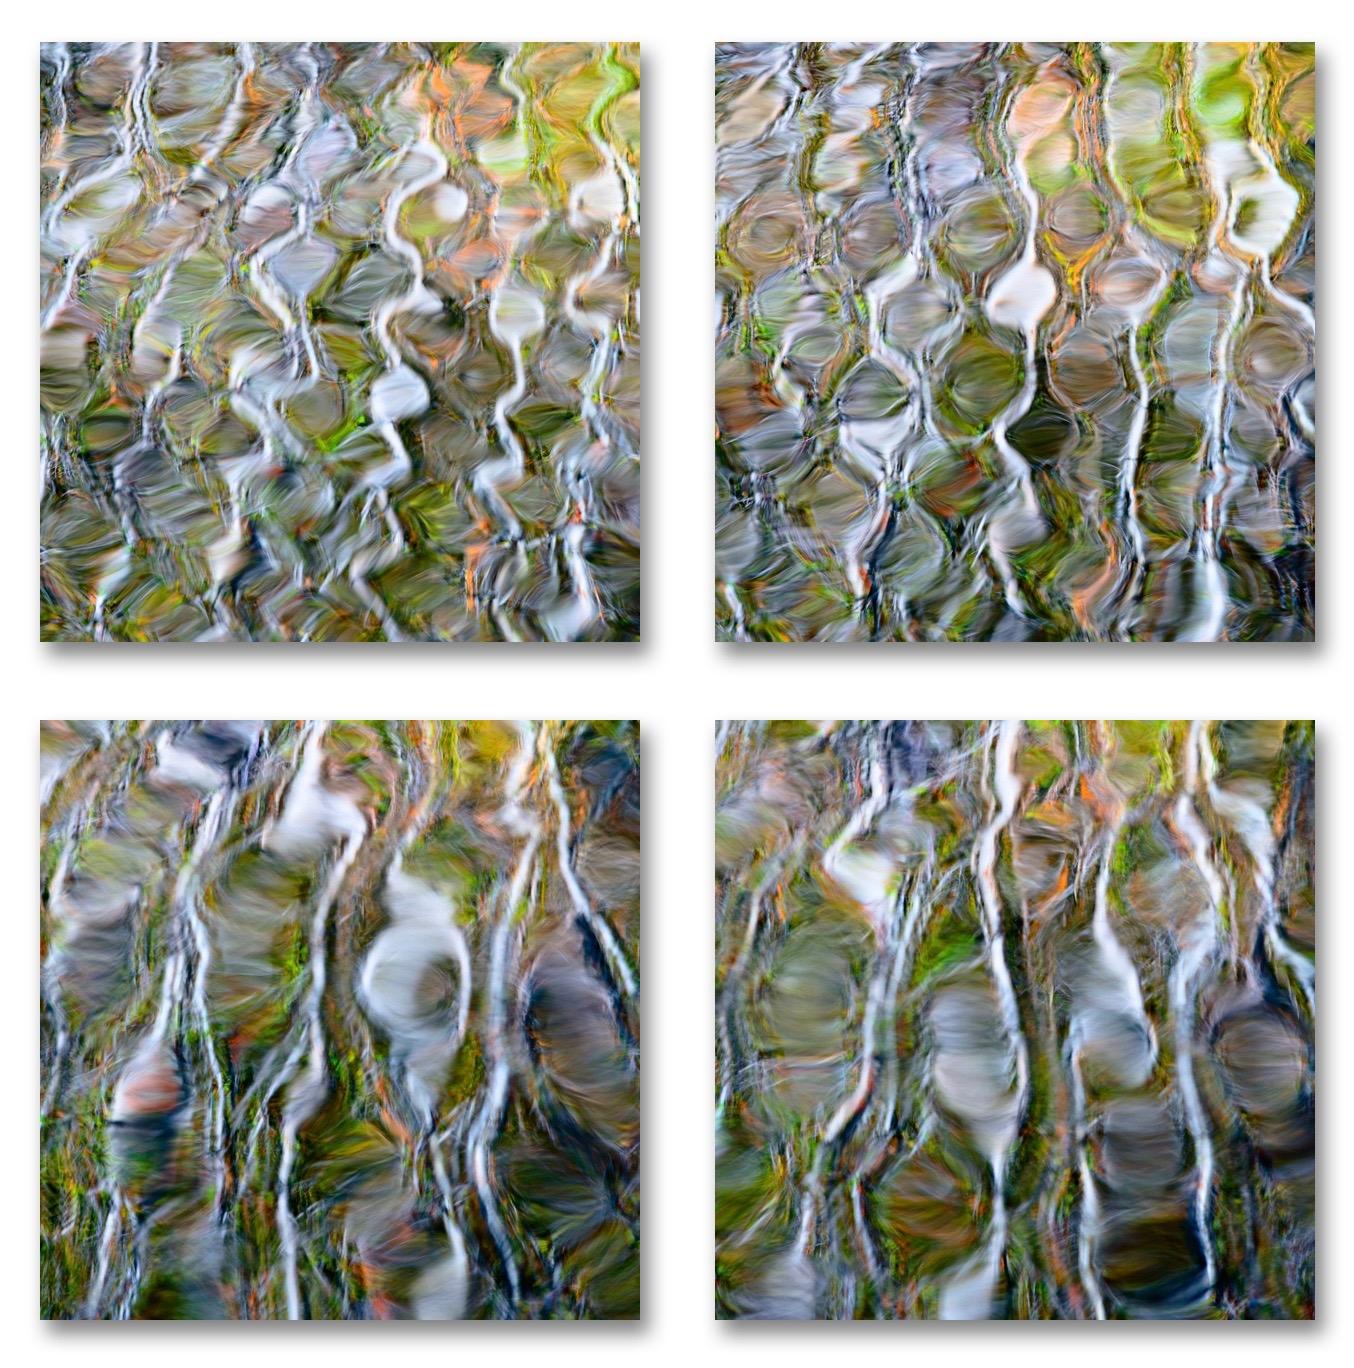 Wavy Reflections, Natural Gems Grouping